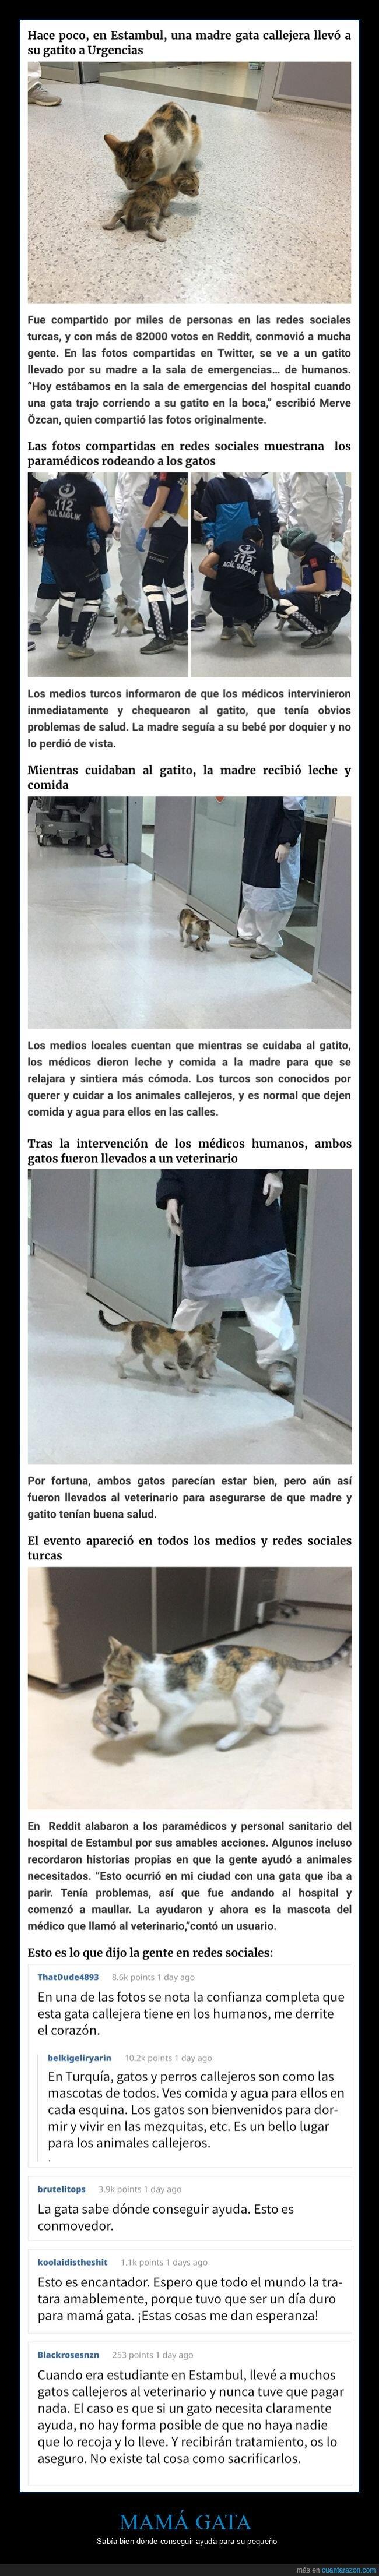 ayuda,gata,hijo,hospital,padre